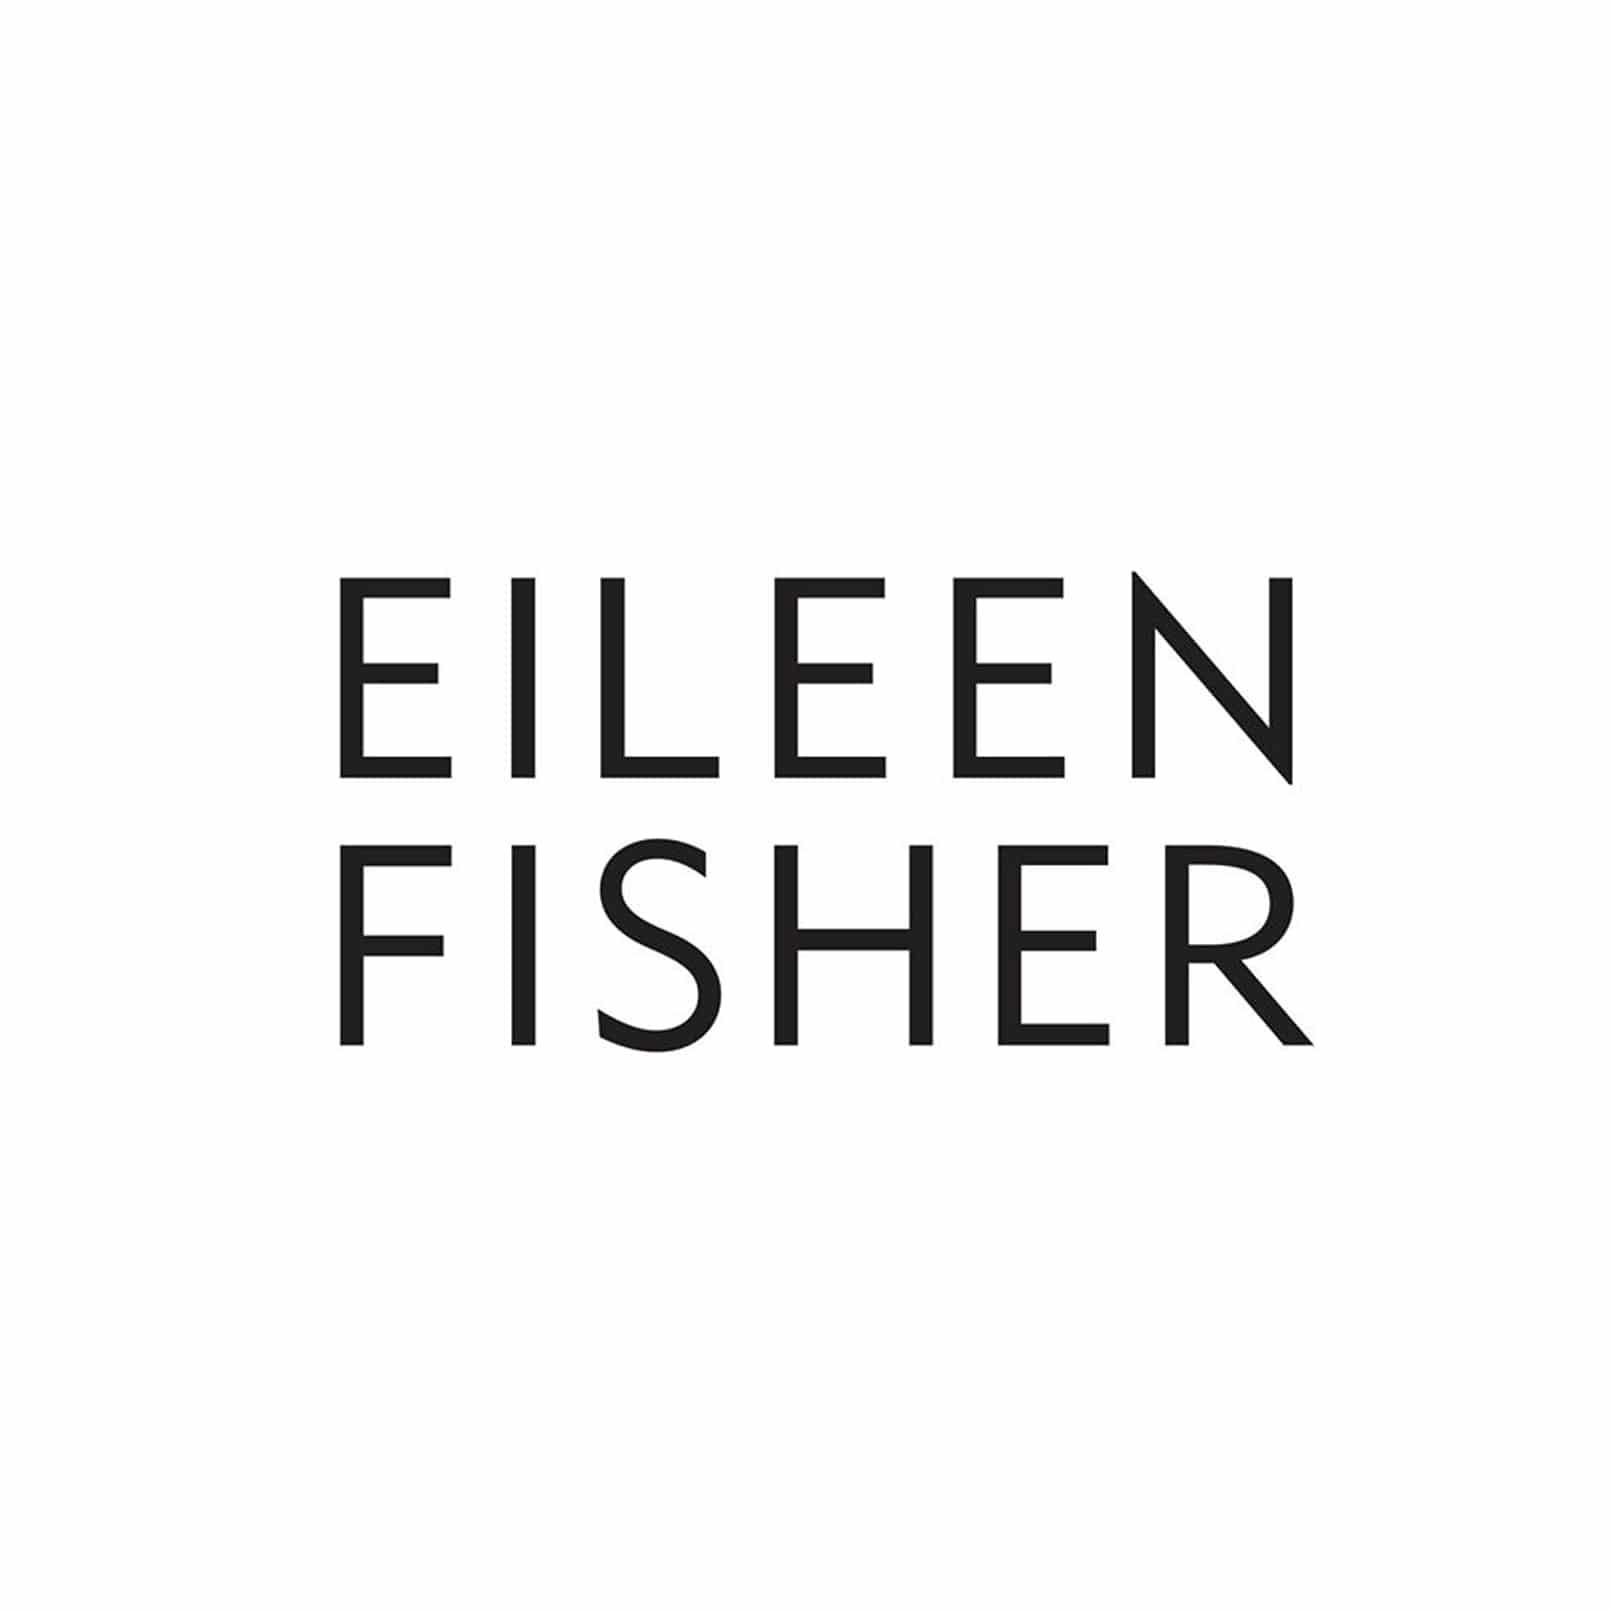 EILEEN FISHER Logo - Verité